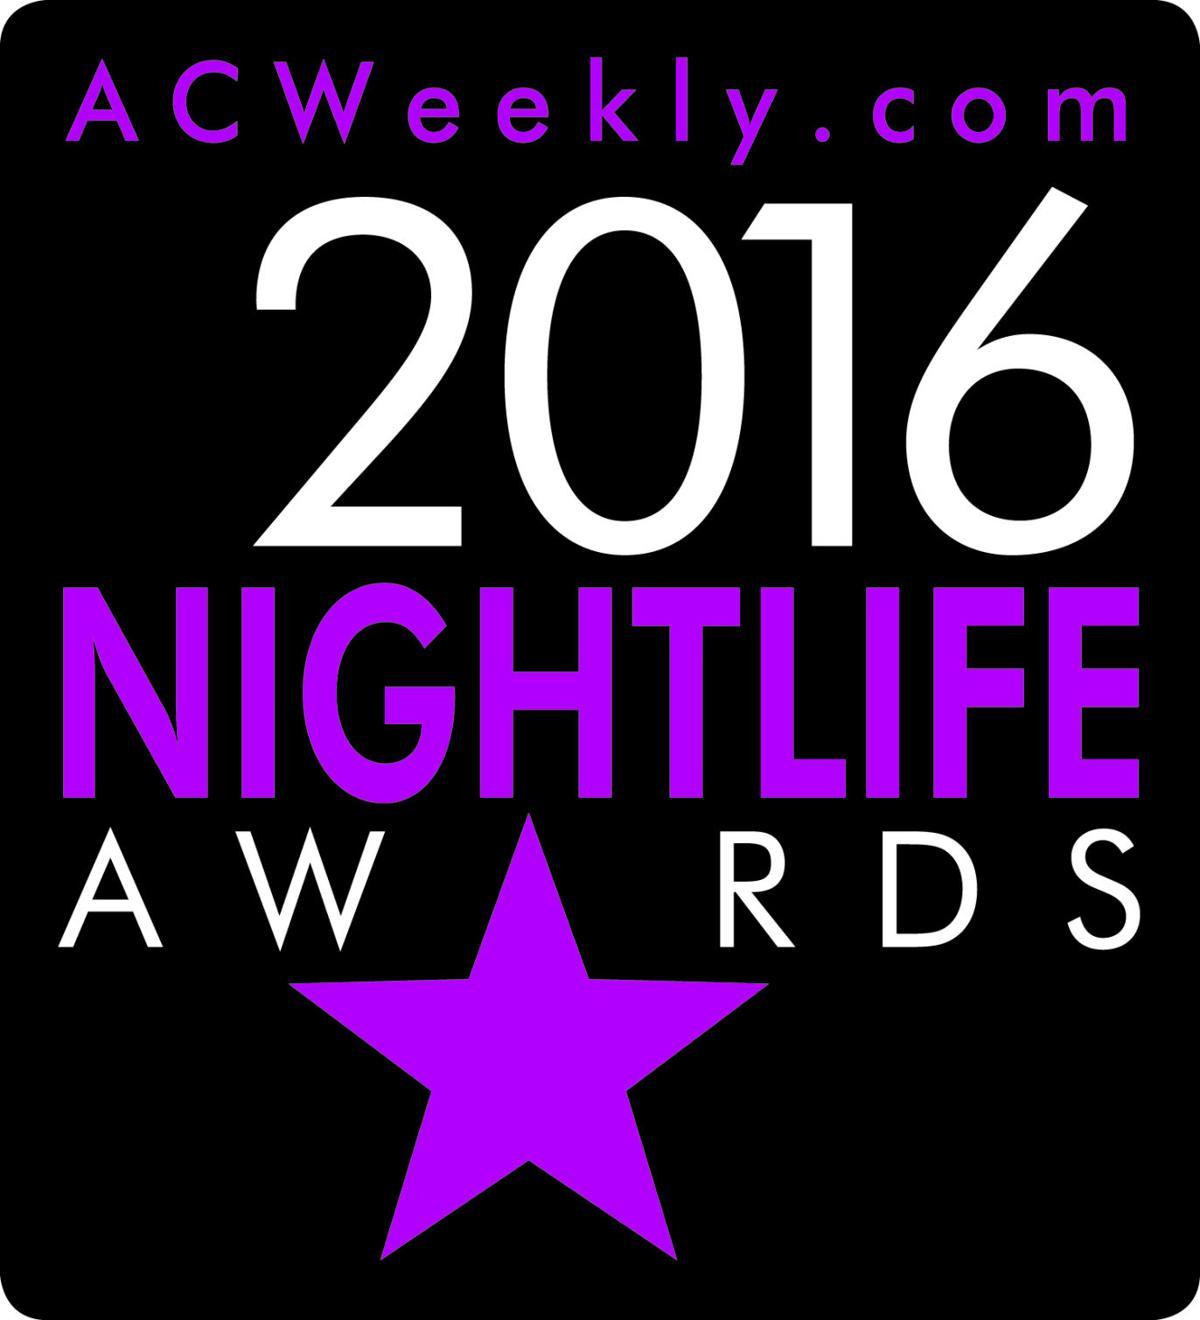 2016 nightlife awards logo